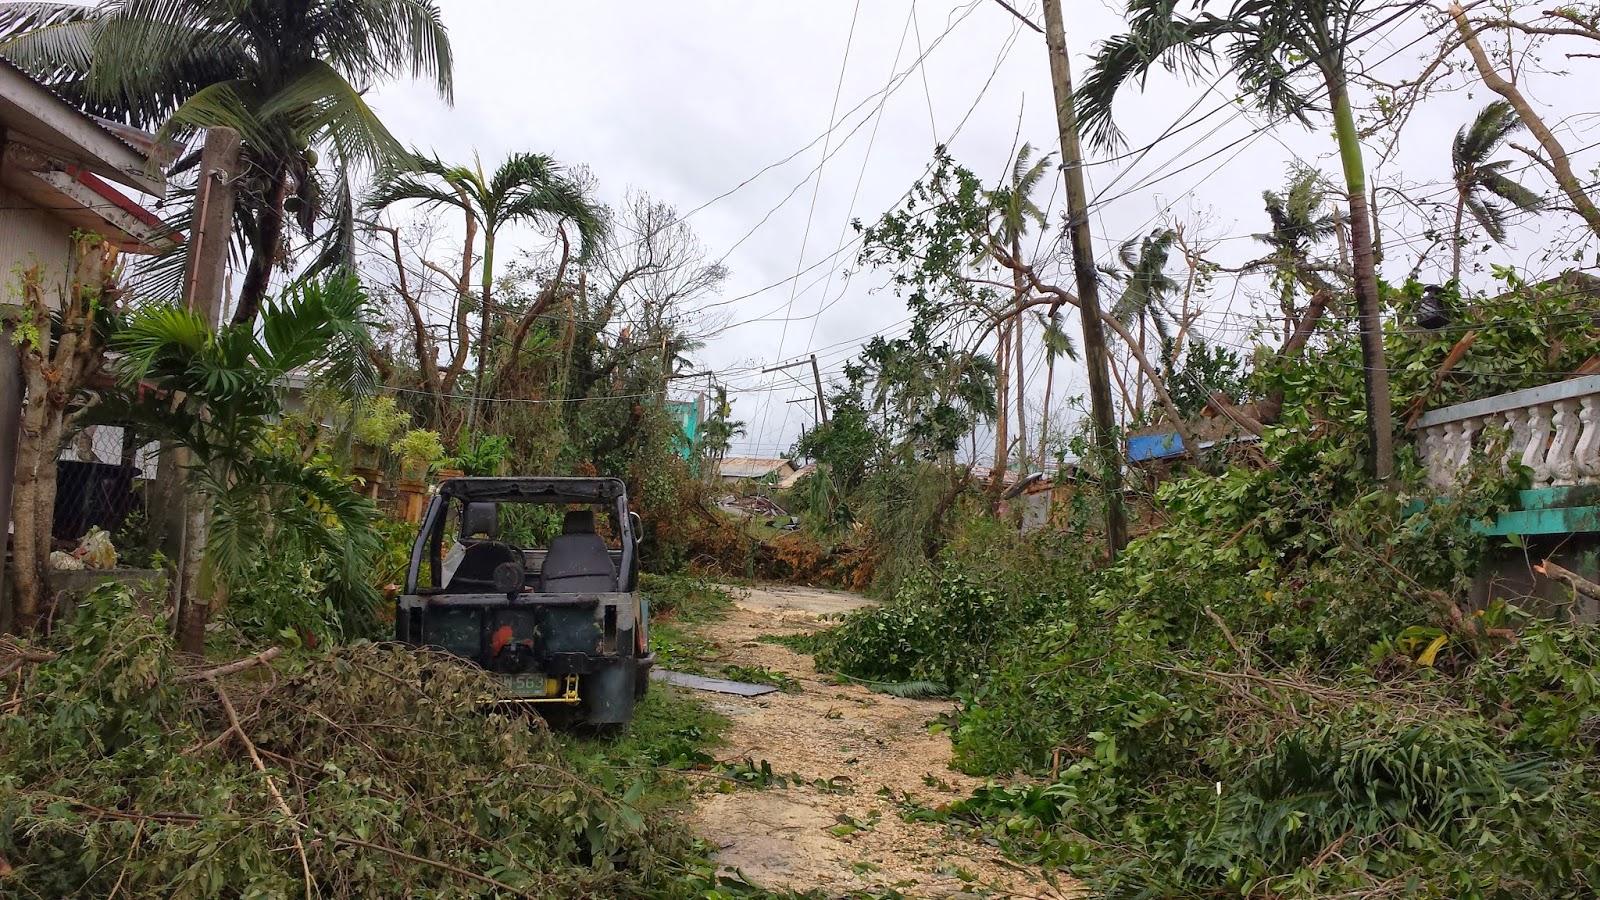 City of Bogo City of Bogo After Typhoon Yolanda Haiyan : 20131108164315 from www.cityofbogo.com size 1600 x 900 jpeg 593kB